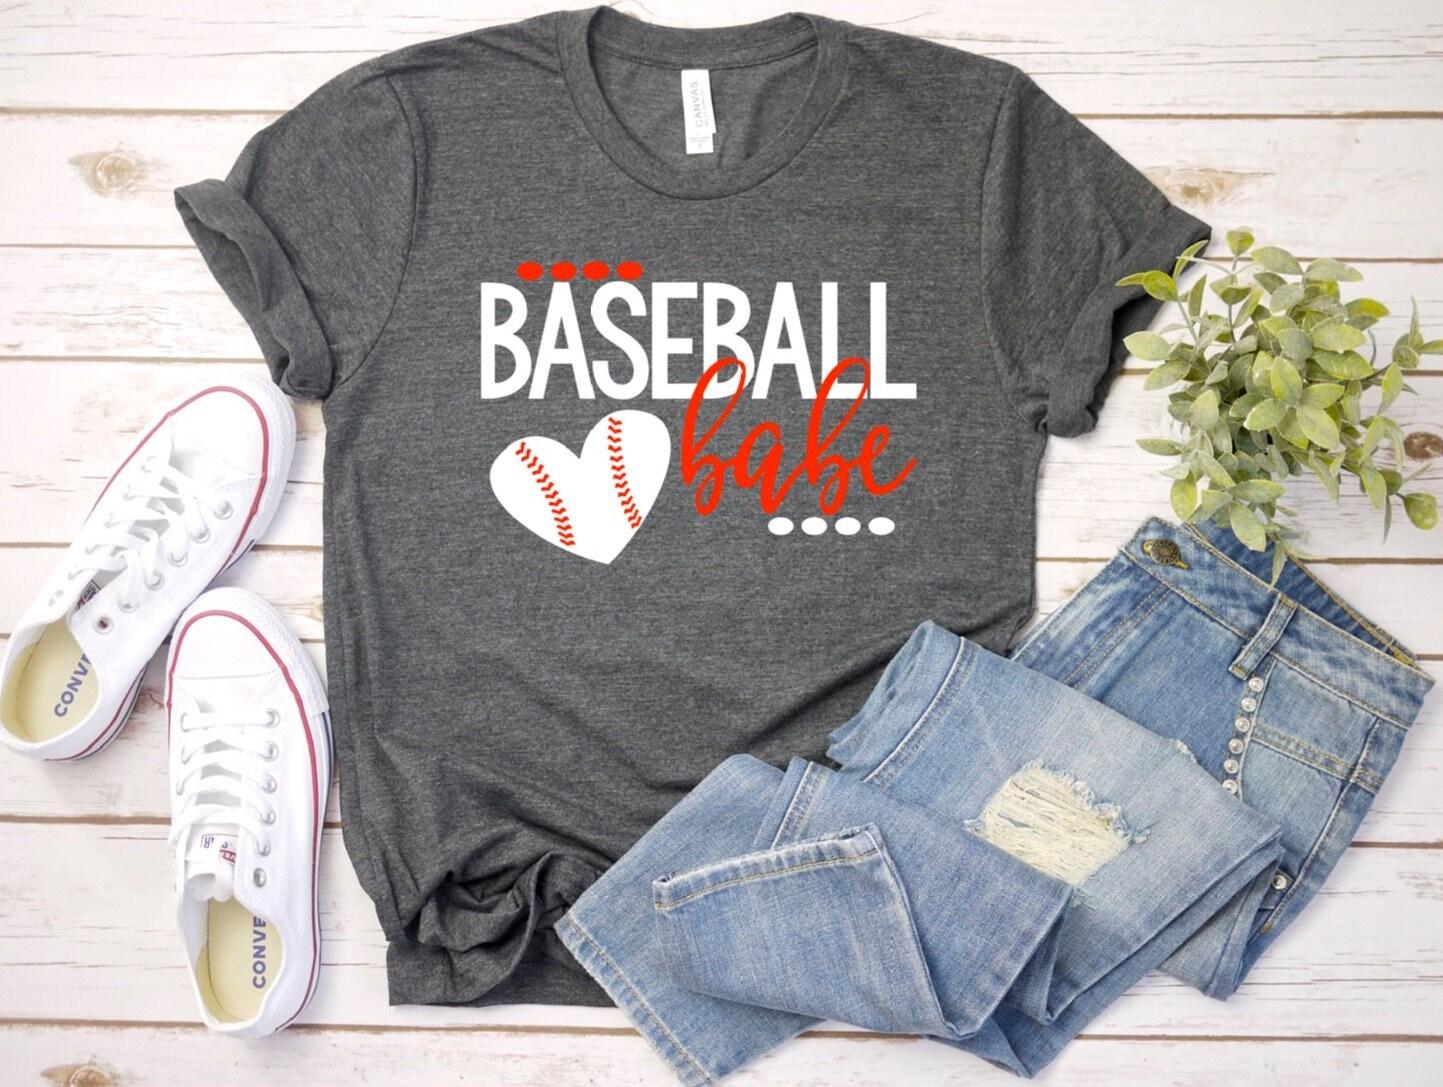 b6991014d Baseball Babe shirt, Baseball Wife Shirt, Baseball Babe Tshirt, Baseball  Girlfriend Shirt, Baseball Wife Tee, Baseball Shirt